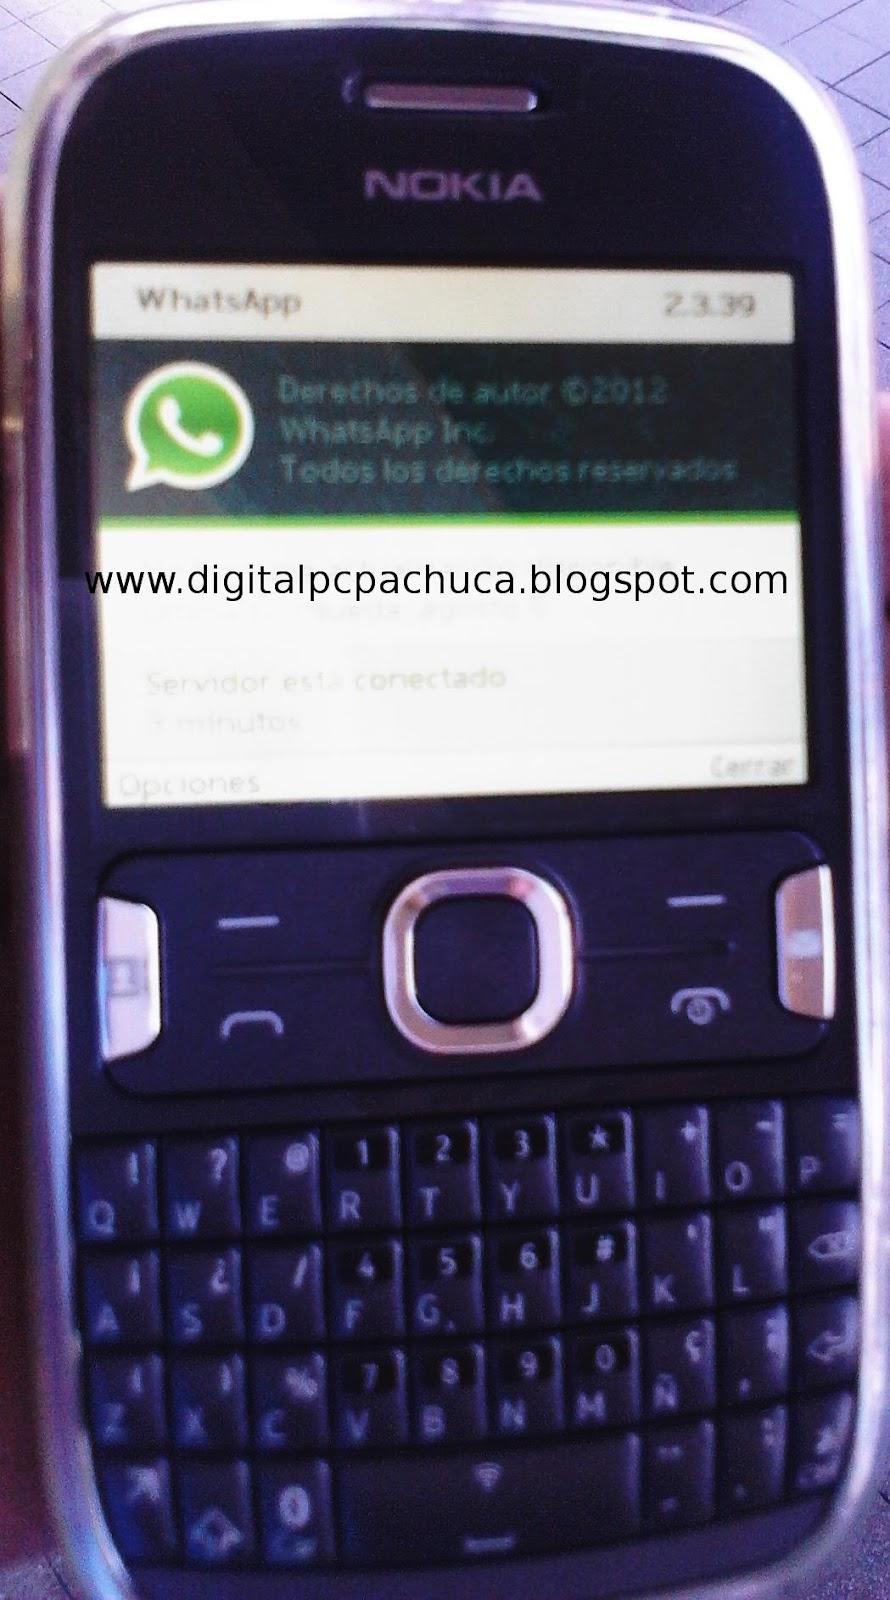 Nokia asha 311 whatsapp download